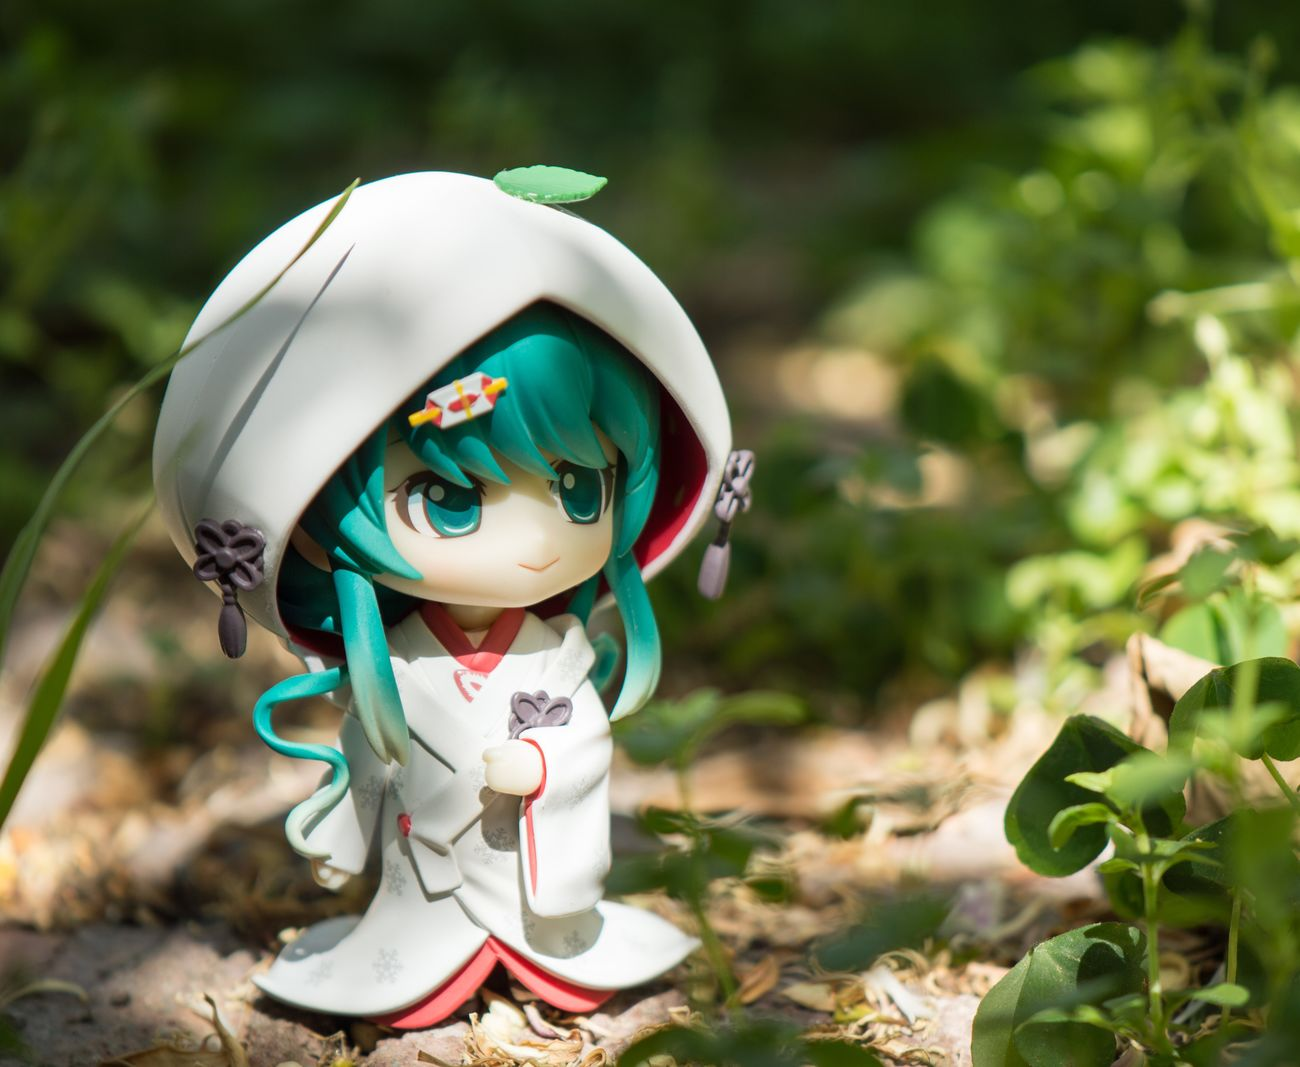 Staring off somewhere. Nendoroid Nendophotography Goodsmilecompany Toyphotography Figurephotography HATSUNEMIKU Miku Vocaloid Snowmiku